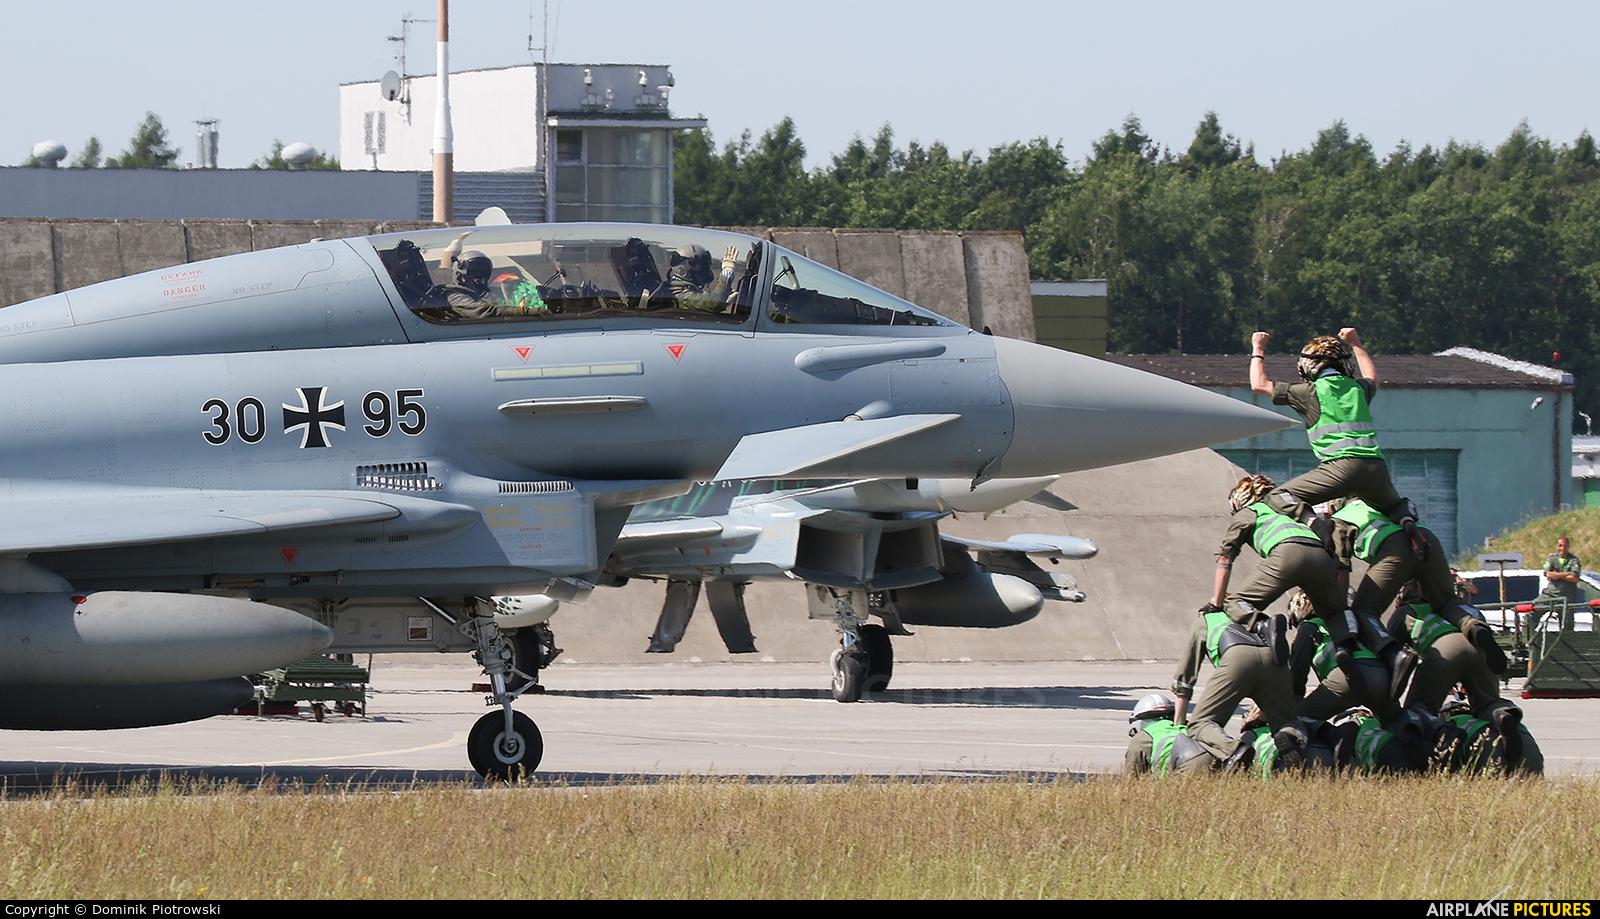 Germany - Air Force - aircraft at Poznań - Krzesiny